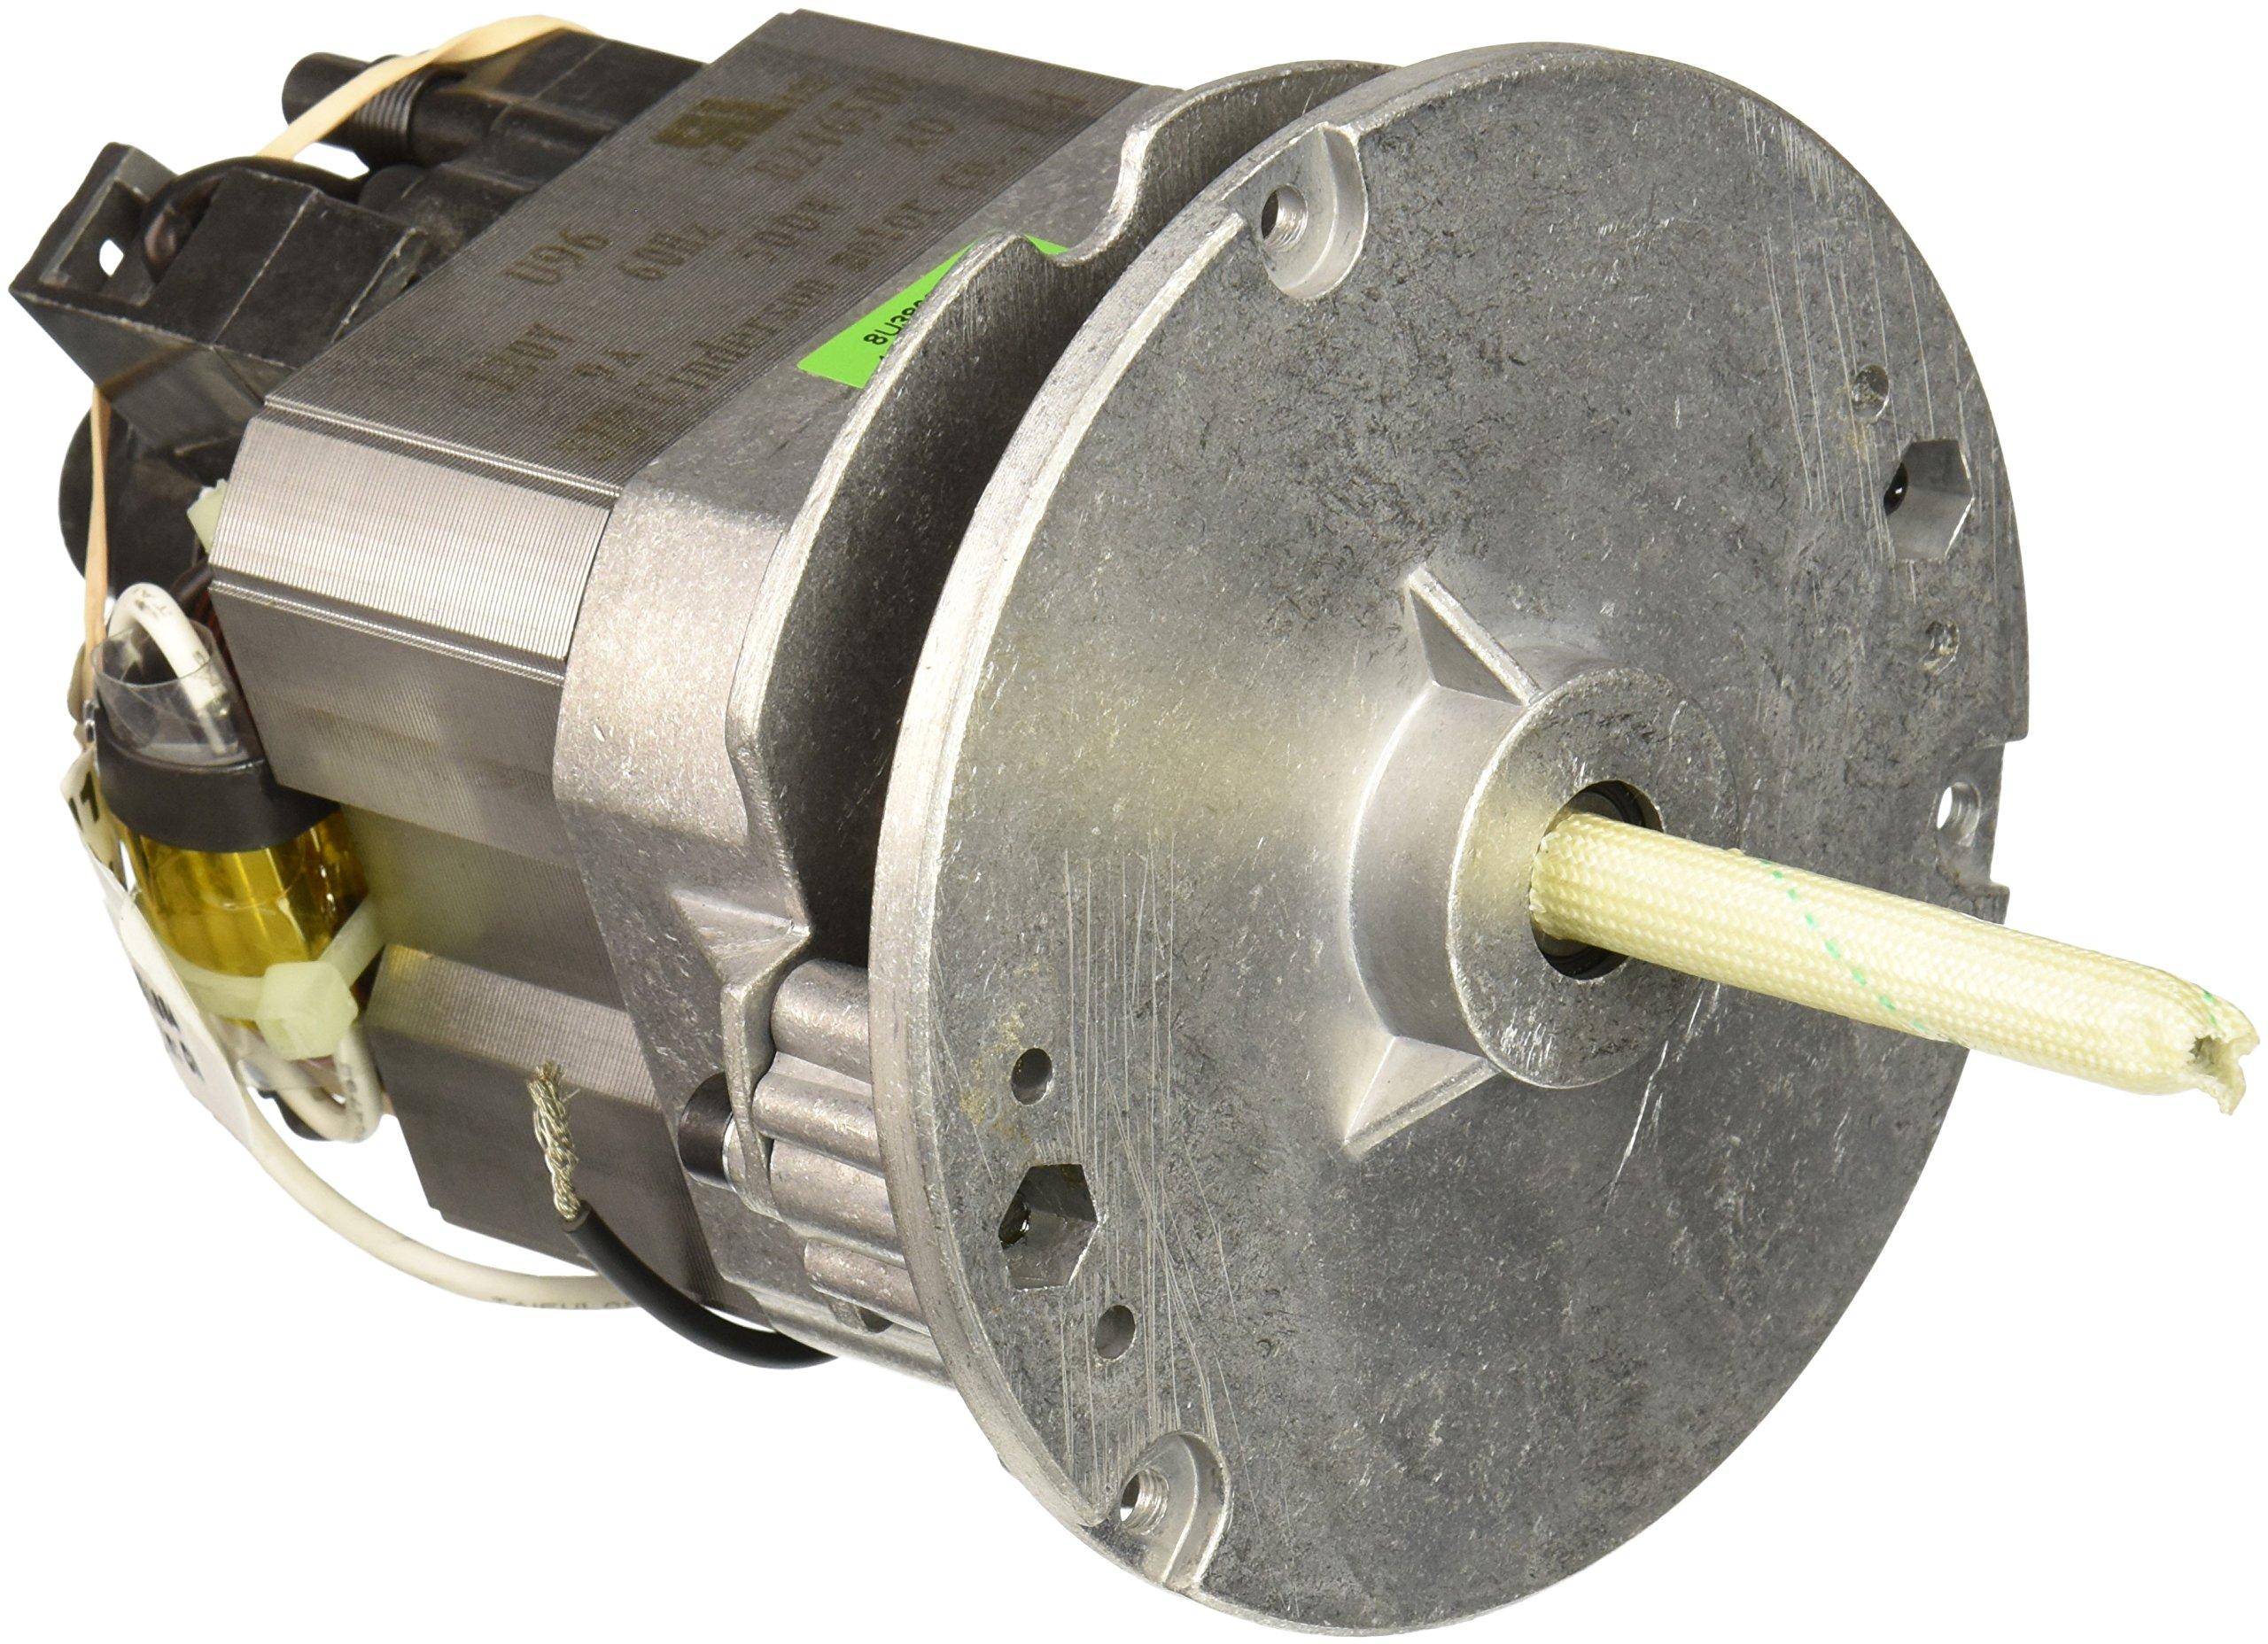 Motor, 10 Amp Metal Upright 1030/89130/1010/1050